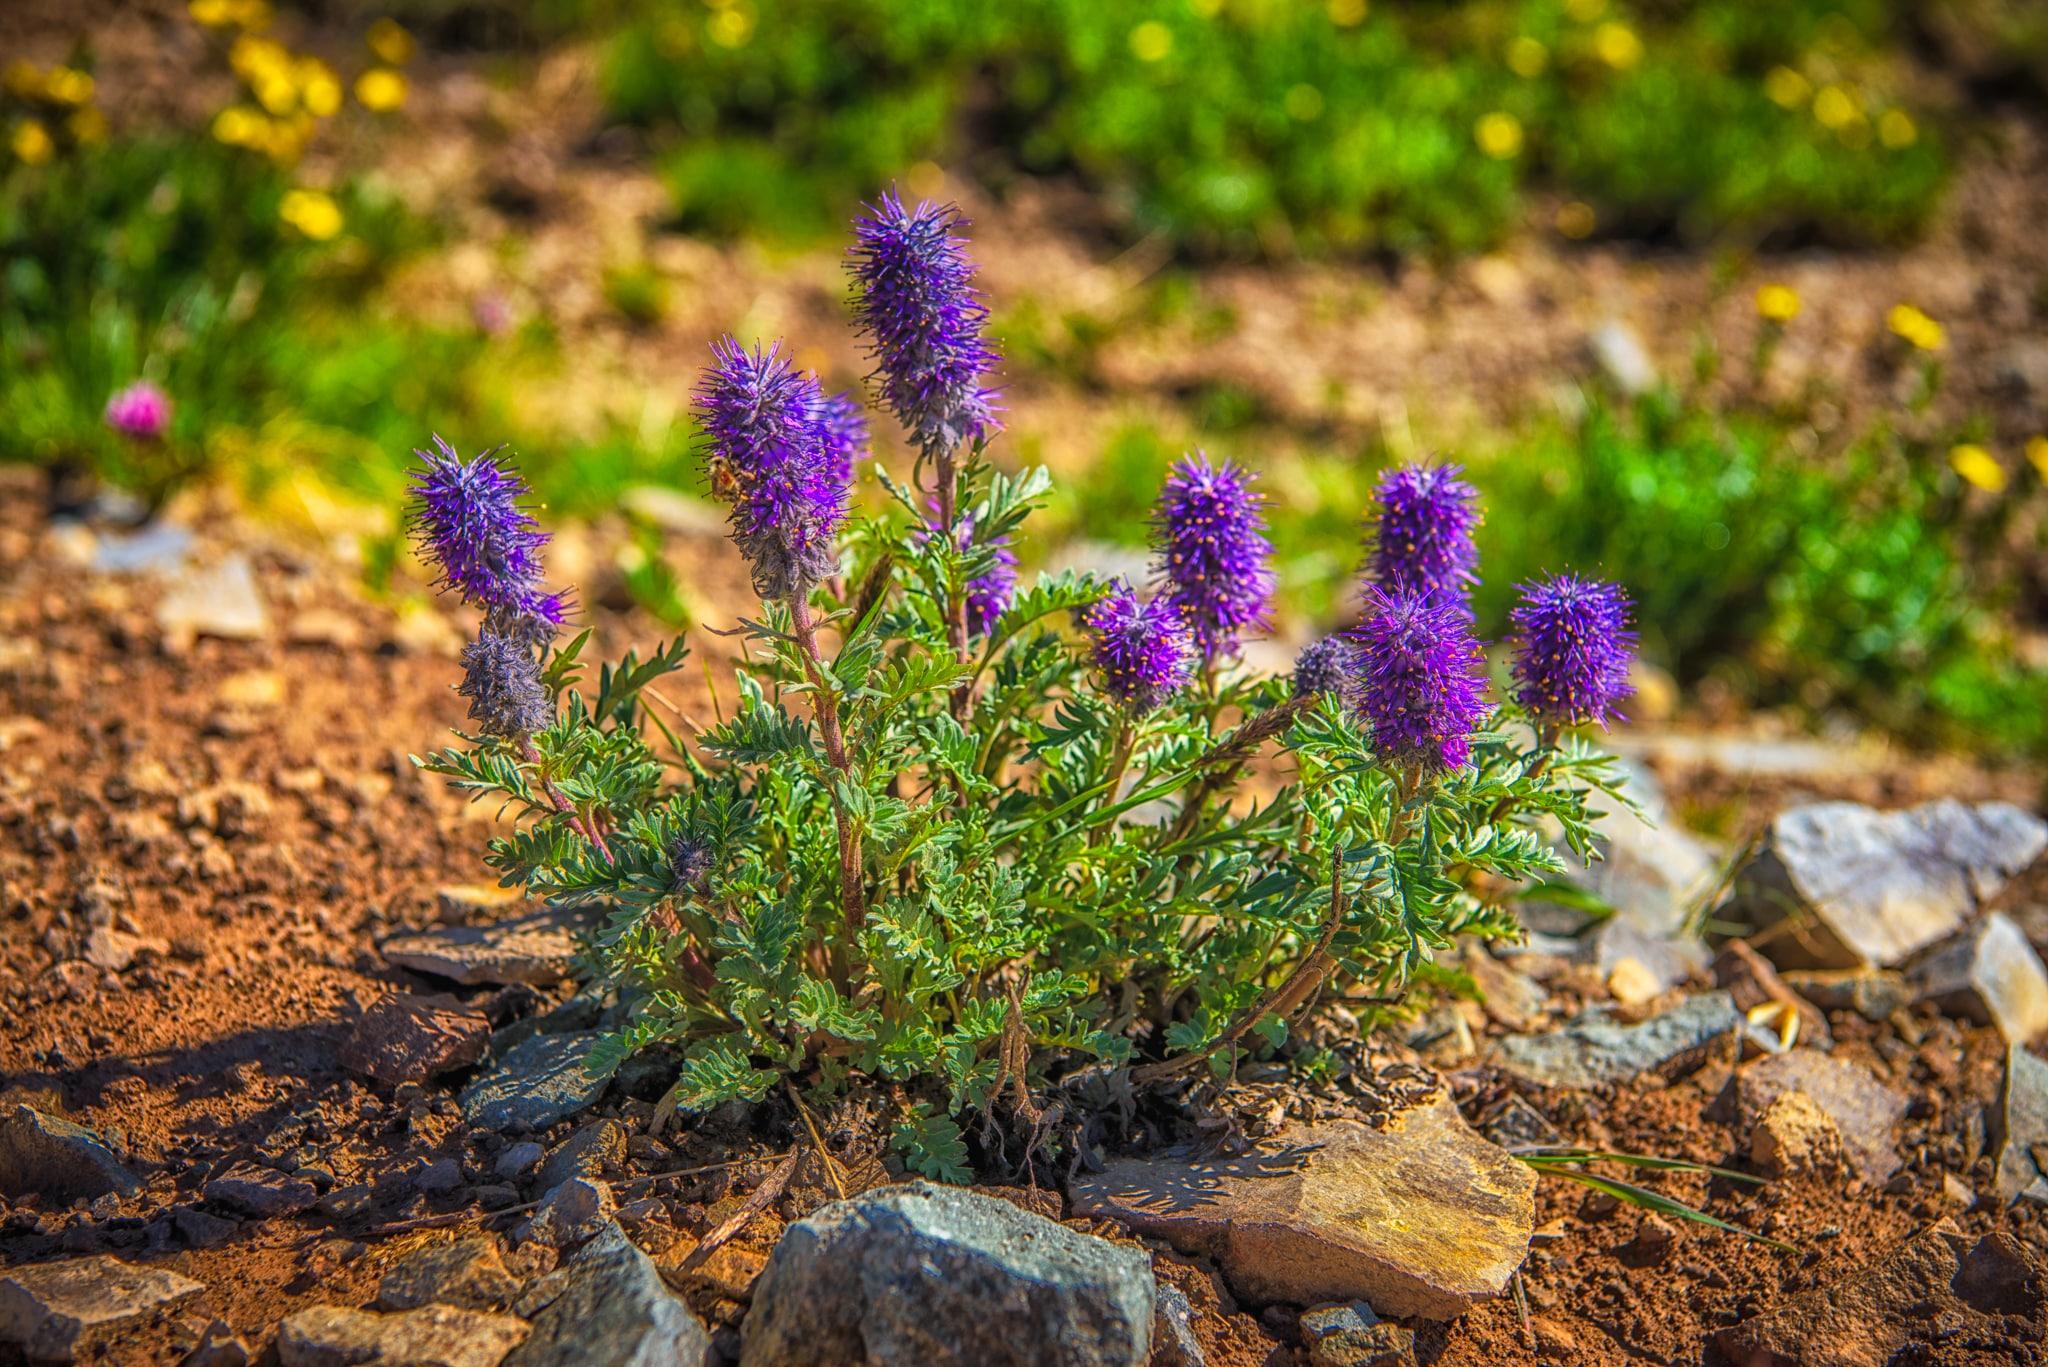 Purple Fringe, or Phacelia sericea, was somewhat sparse along Stony Pass Road above treeline.